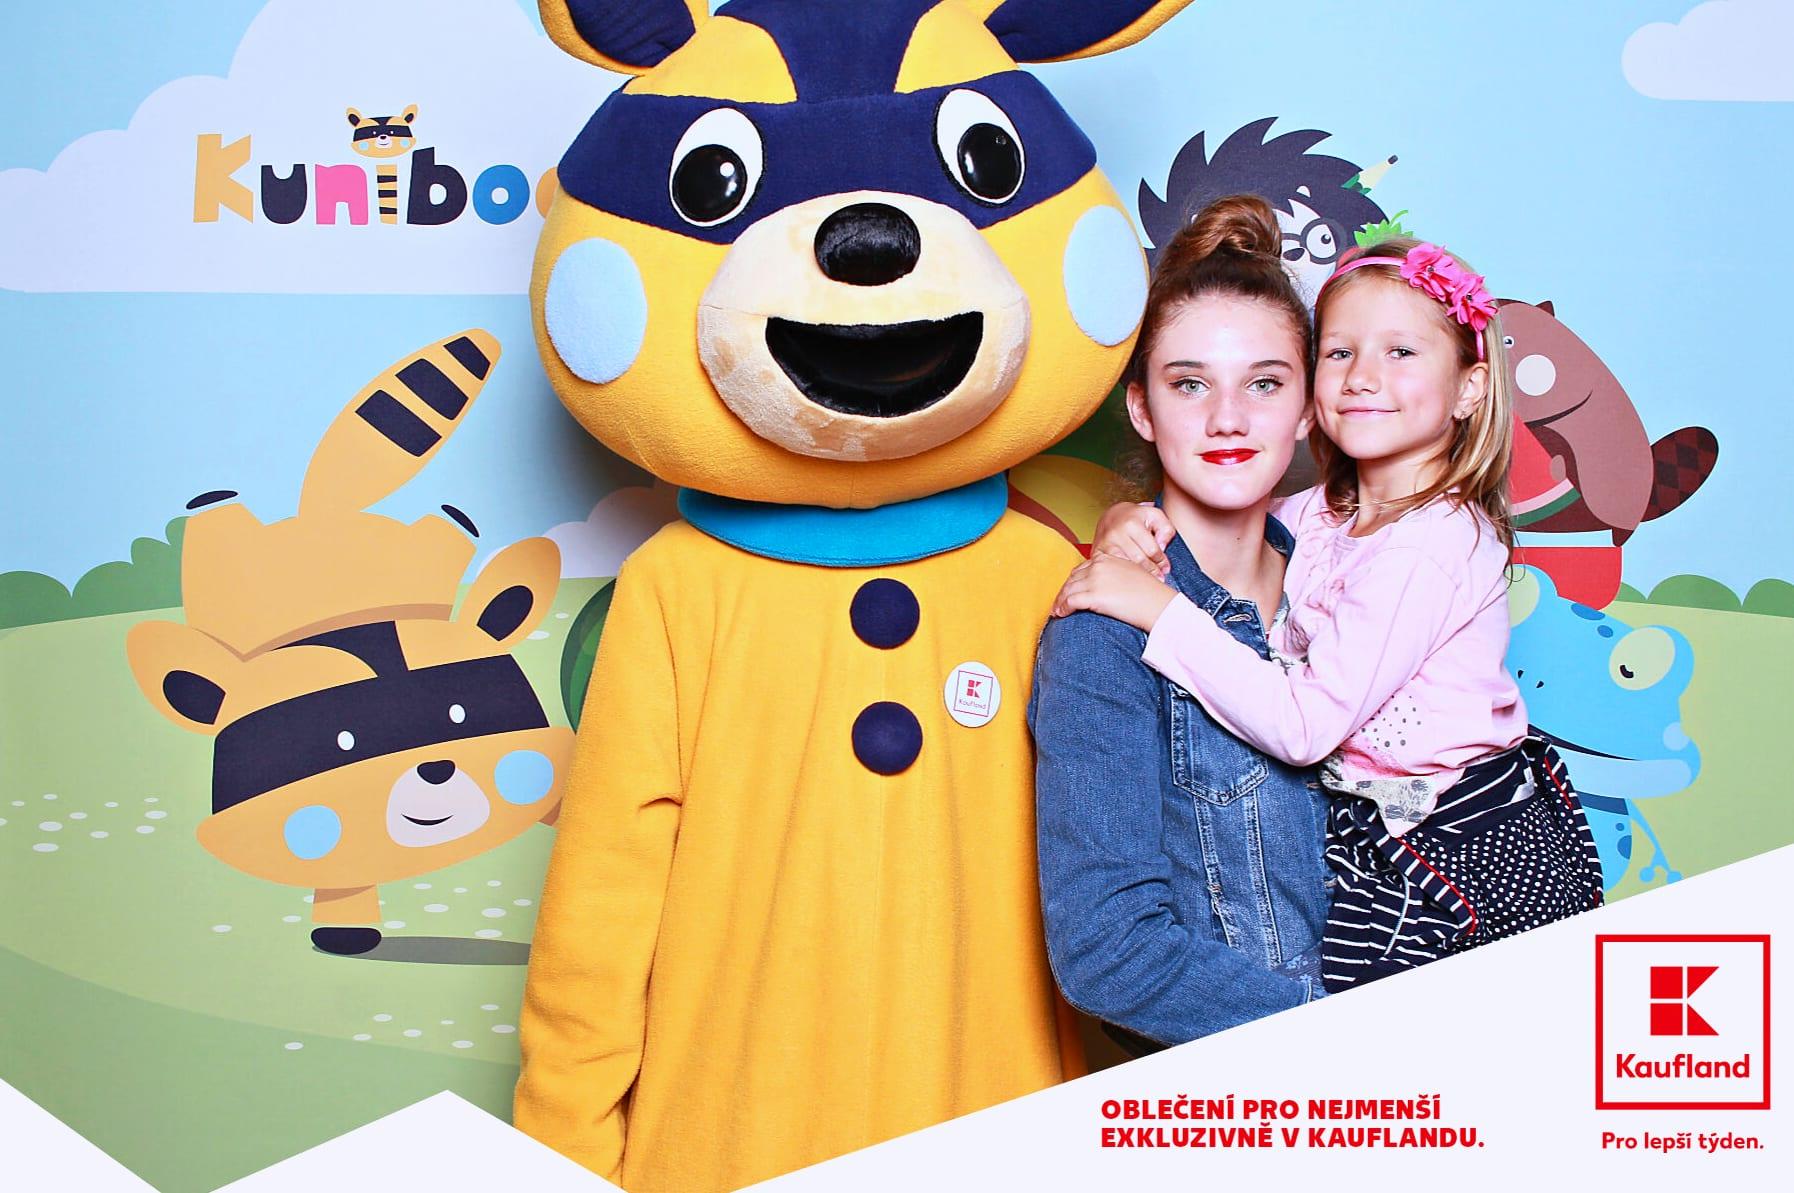 fotokoutek-karlovy-vary-promo-akce-kaufland-kuniboo-29-9-2019-659599